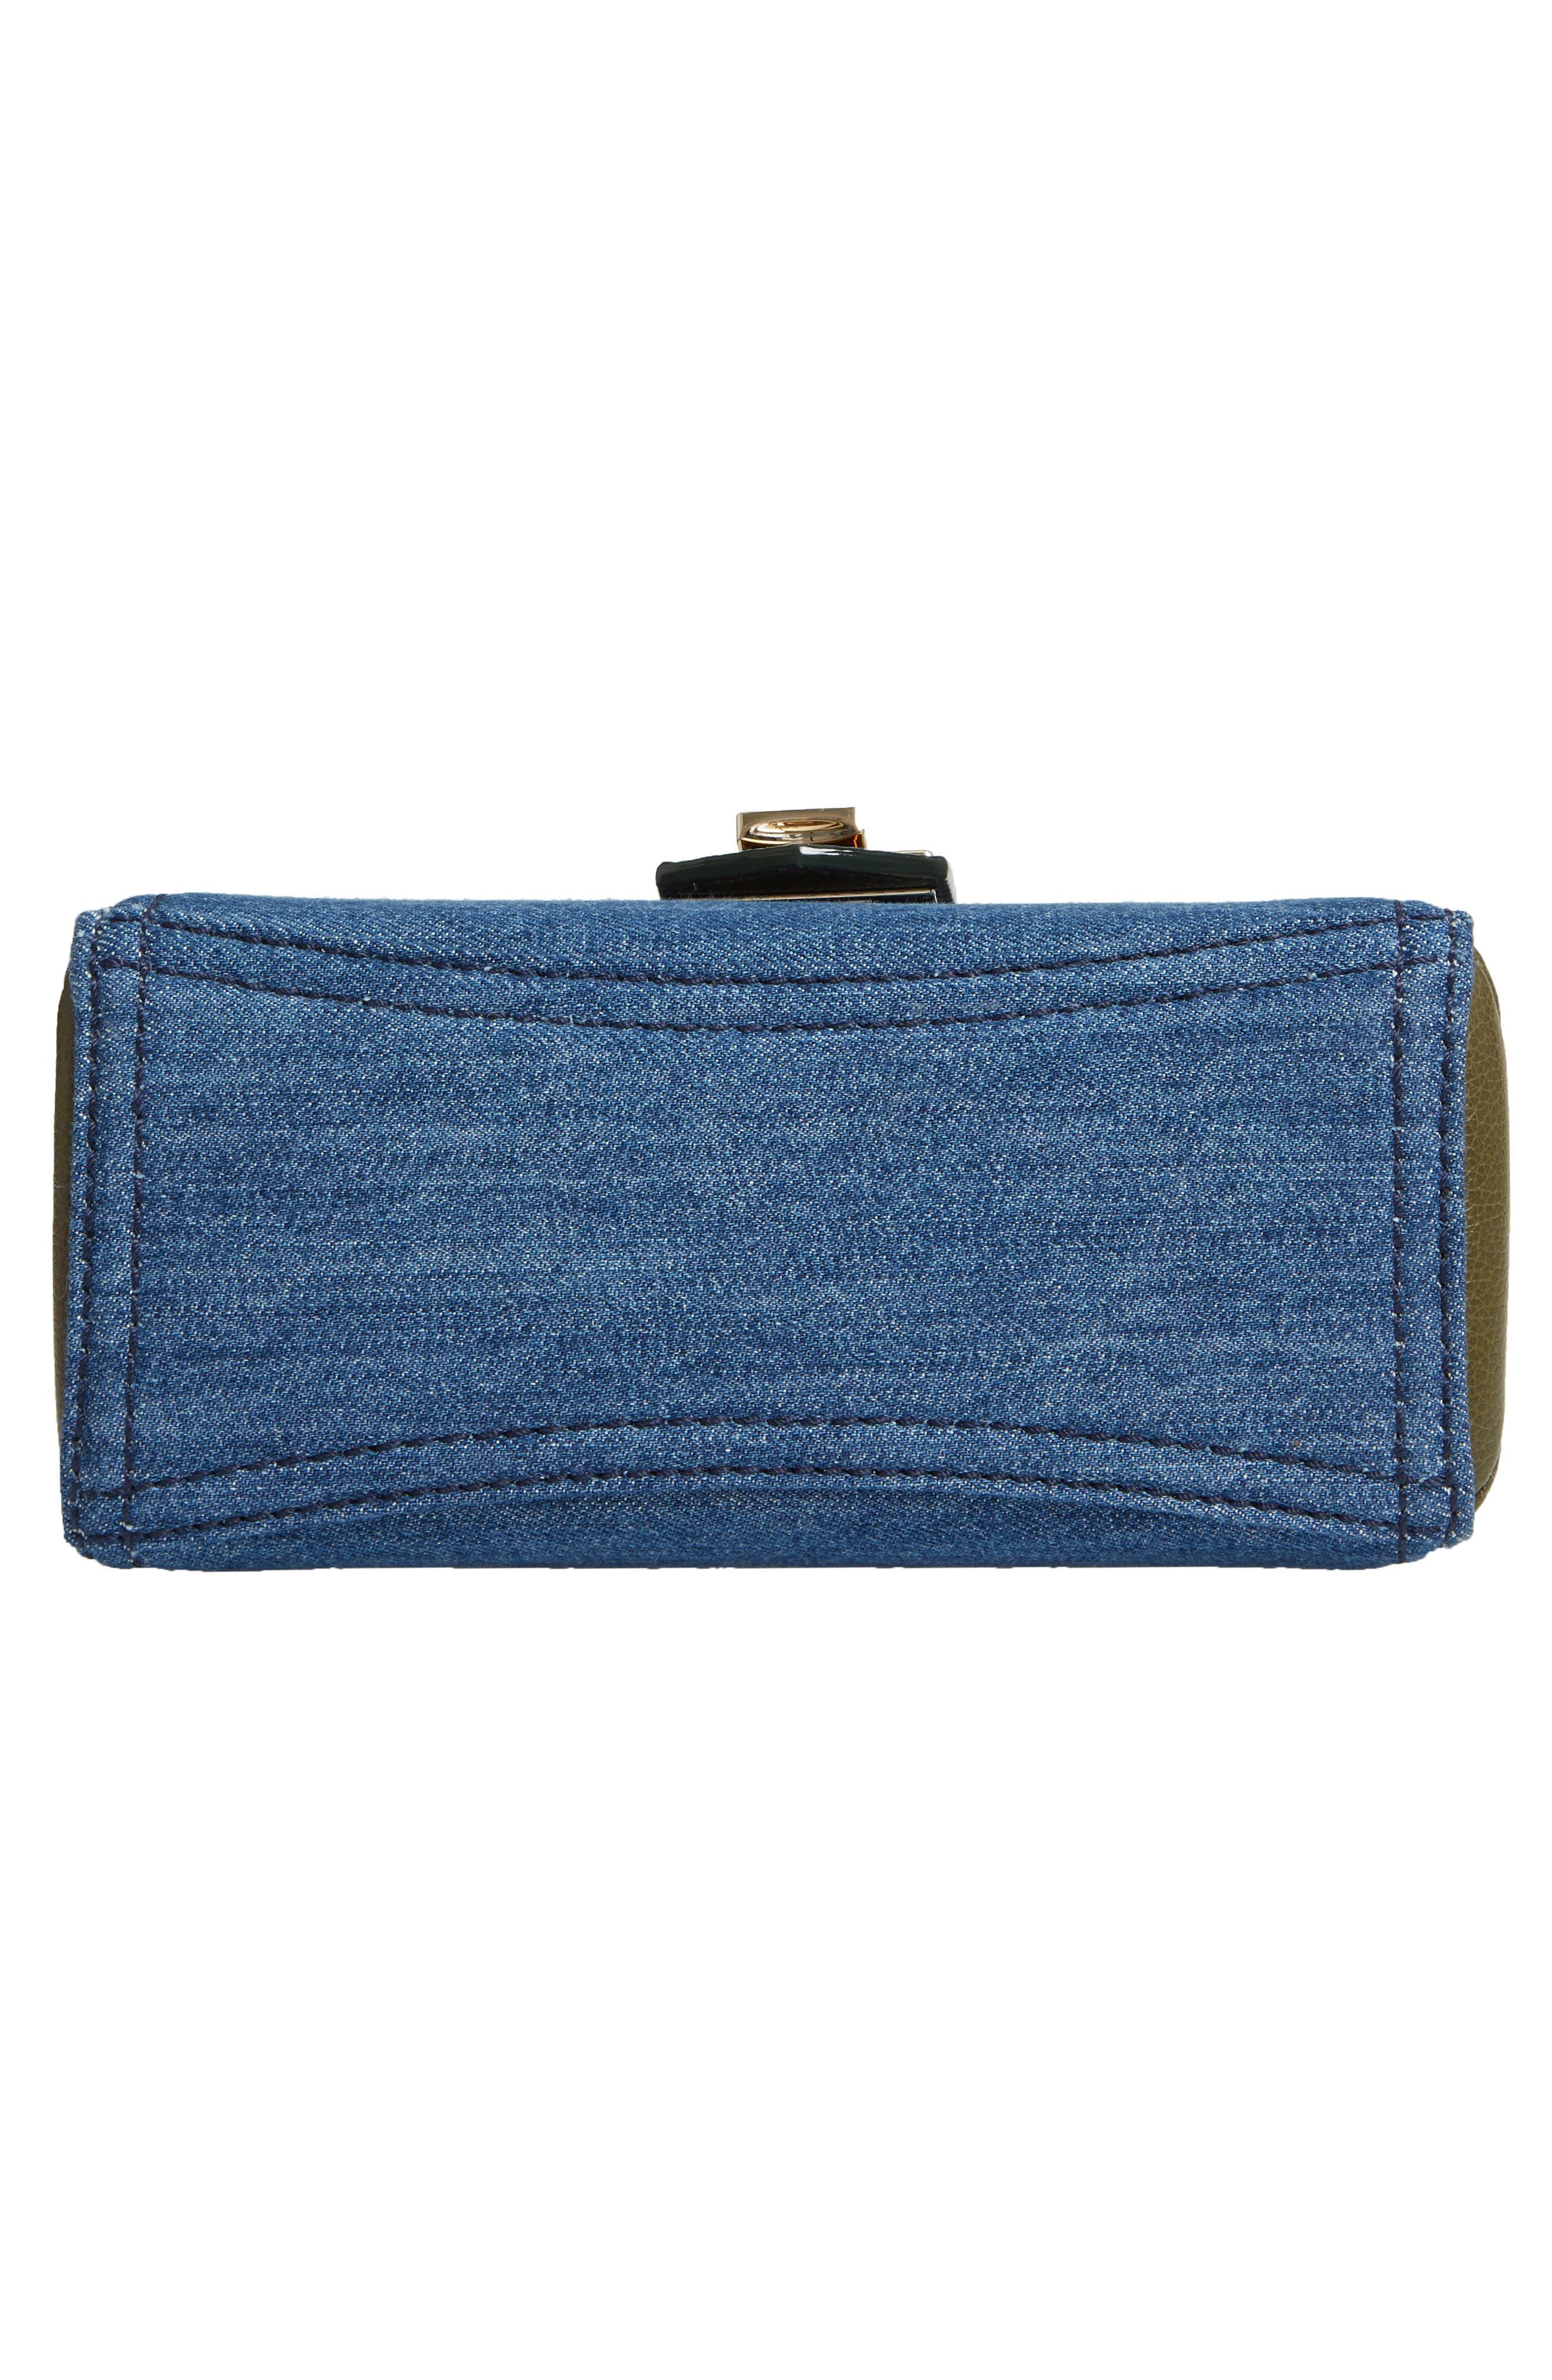 Marianne Leather & Genuine Snakeskin Crossbody Bag,                             Alternate thumbnail 7, color,                             NAVY MIX